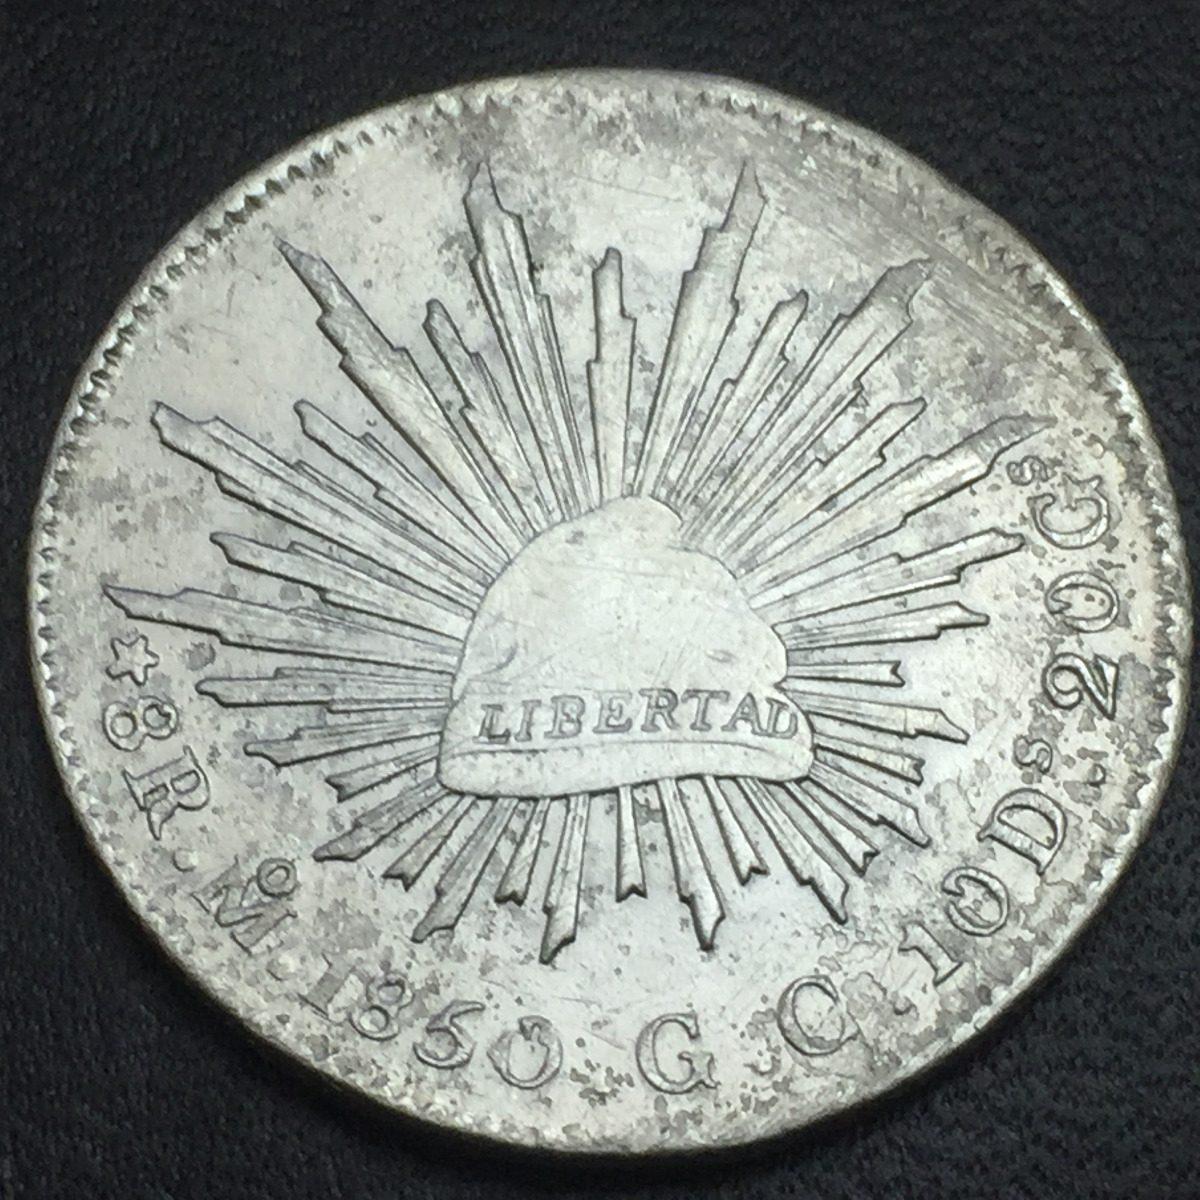 83d417efc19e moneda republica 8 reales méxico 1850 gc plata bonito. Cargando zoom.